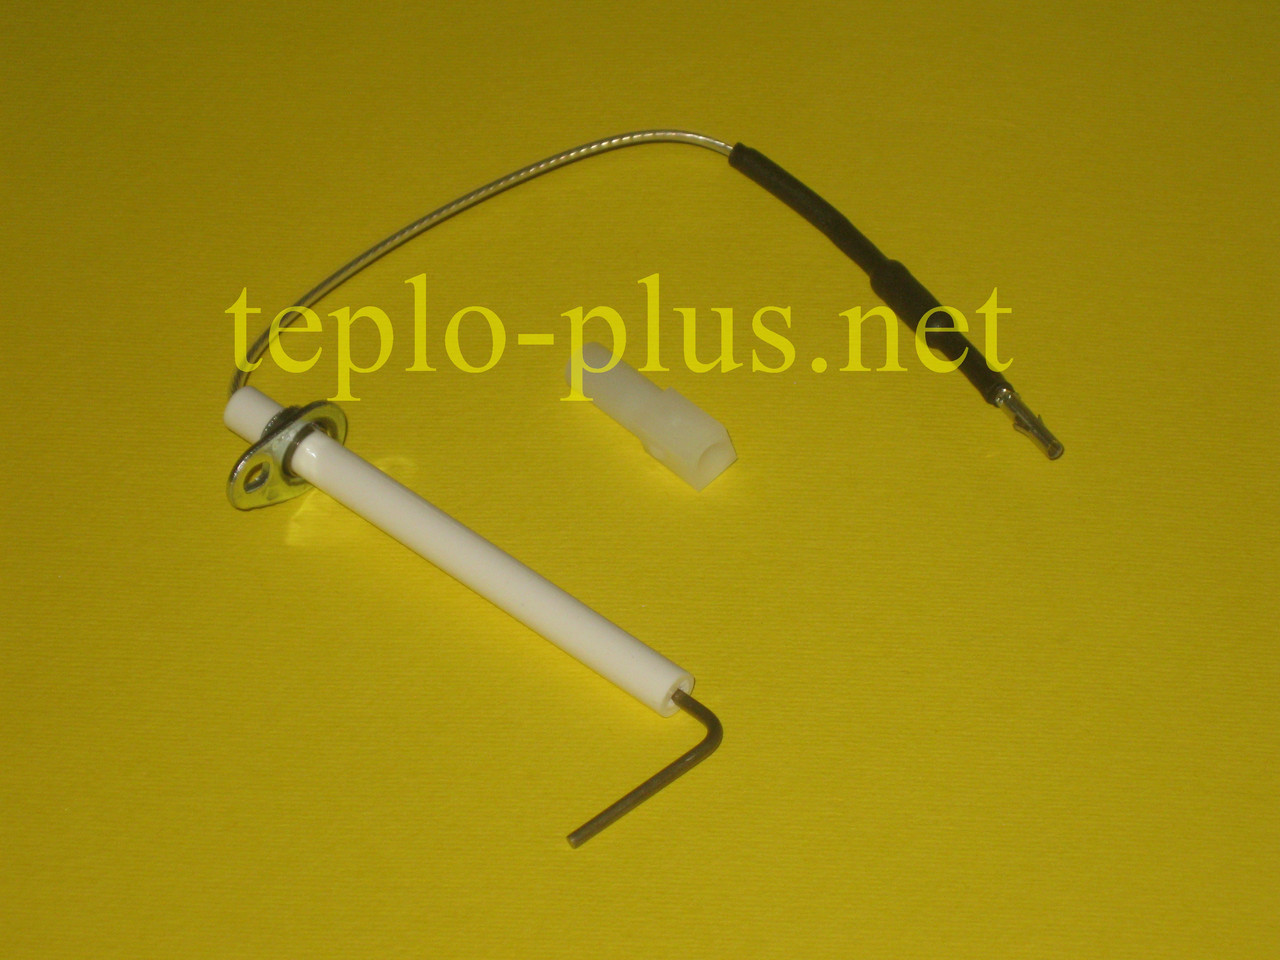 Электрод розжига и ионизации BI1373101 Biasi Rinnova M290.24CM/M, M290.24CV/M, M290.24BV/M, Inovia M290.24CM/T